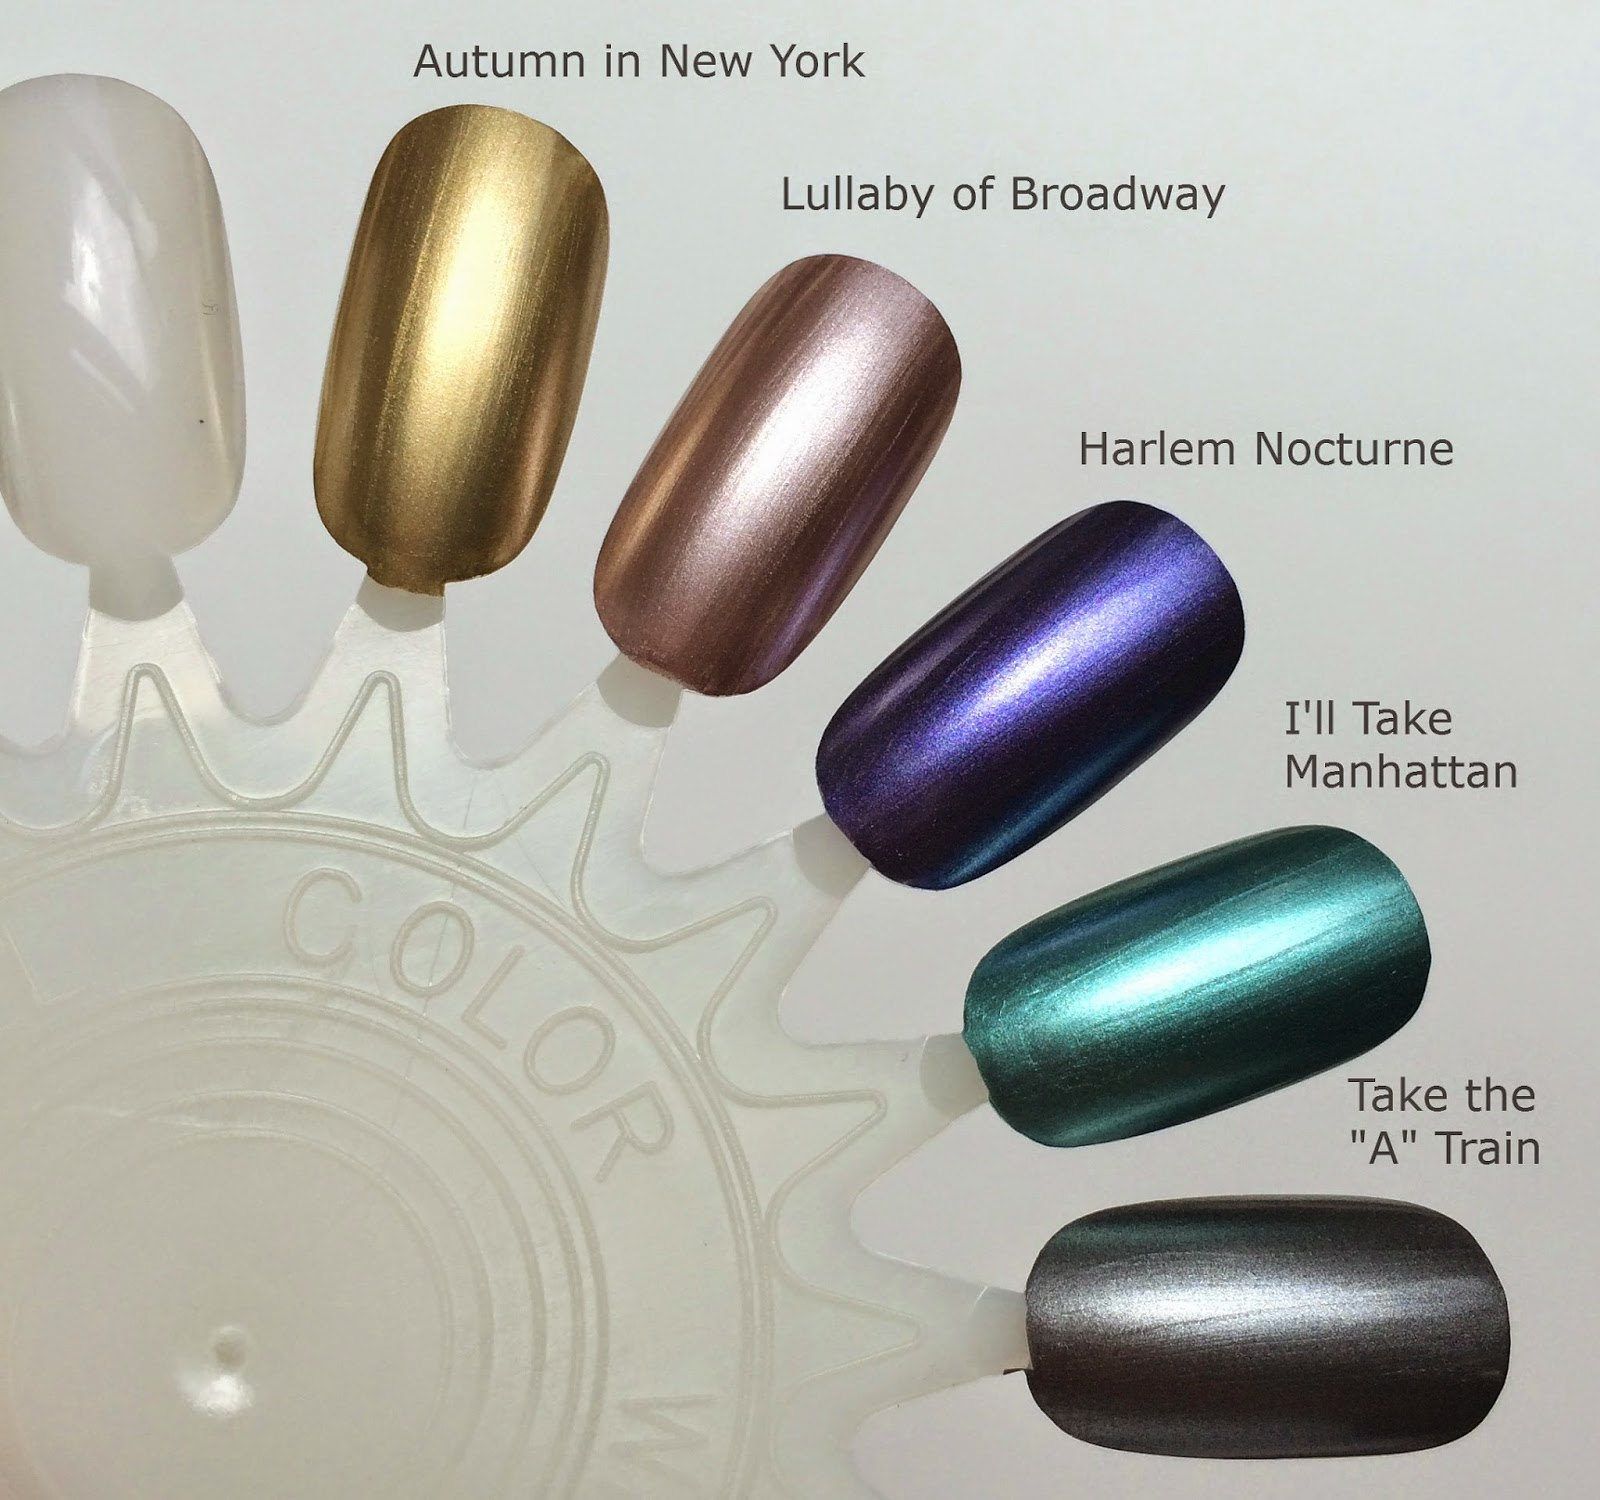 Deborah Lippmann Fall 2014 New York Marquee Swatches